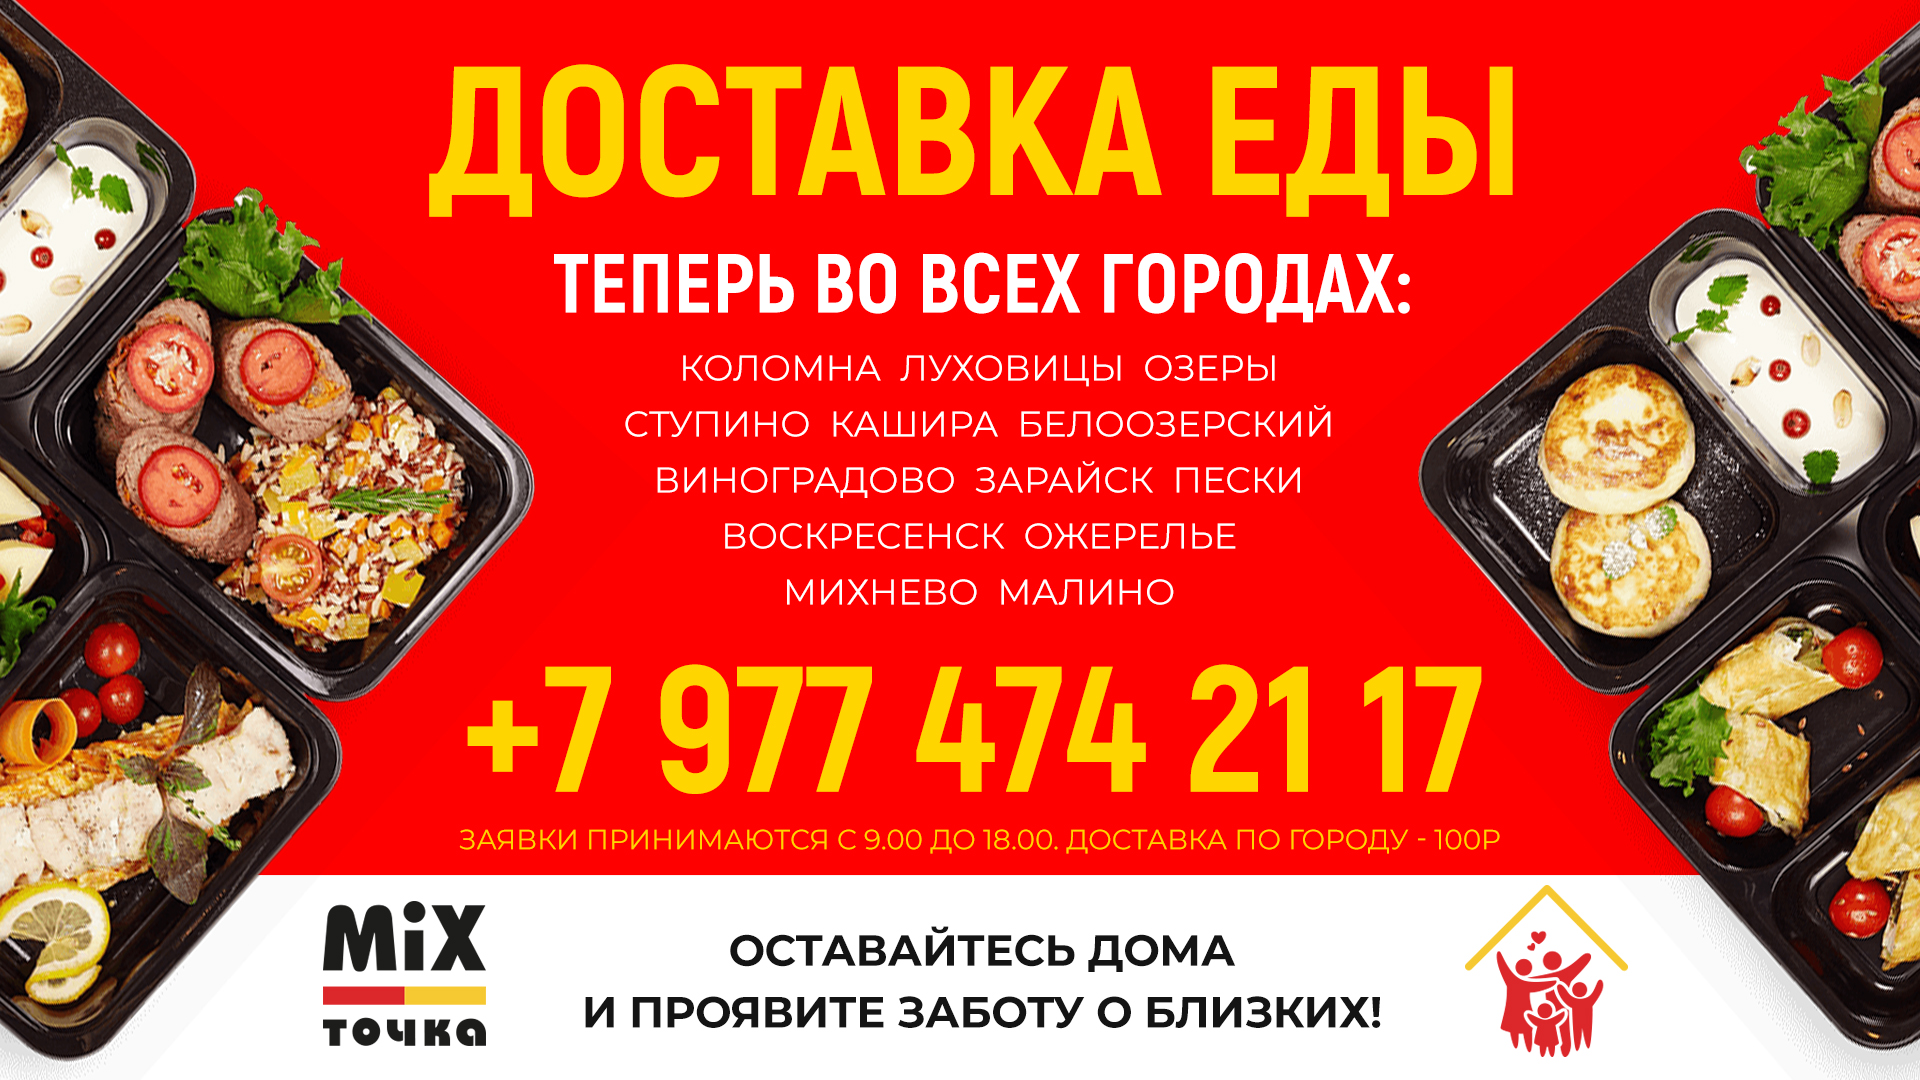 Доставка +7 977 474 21 17